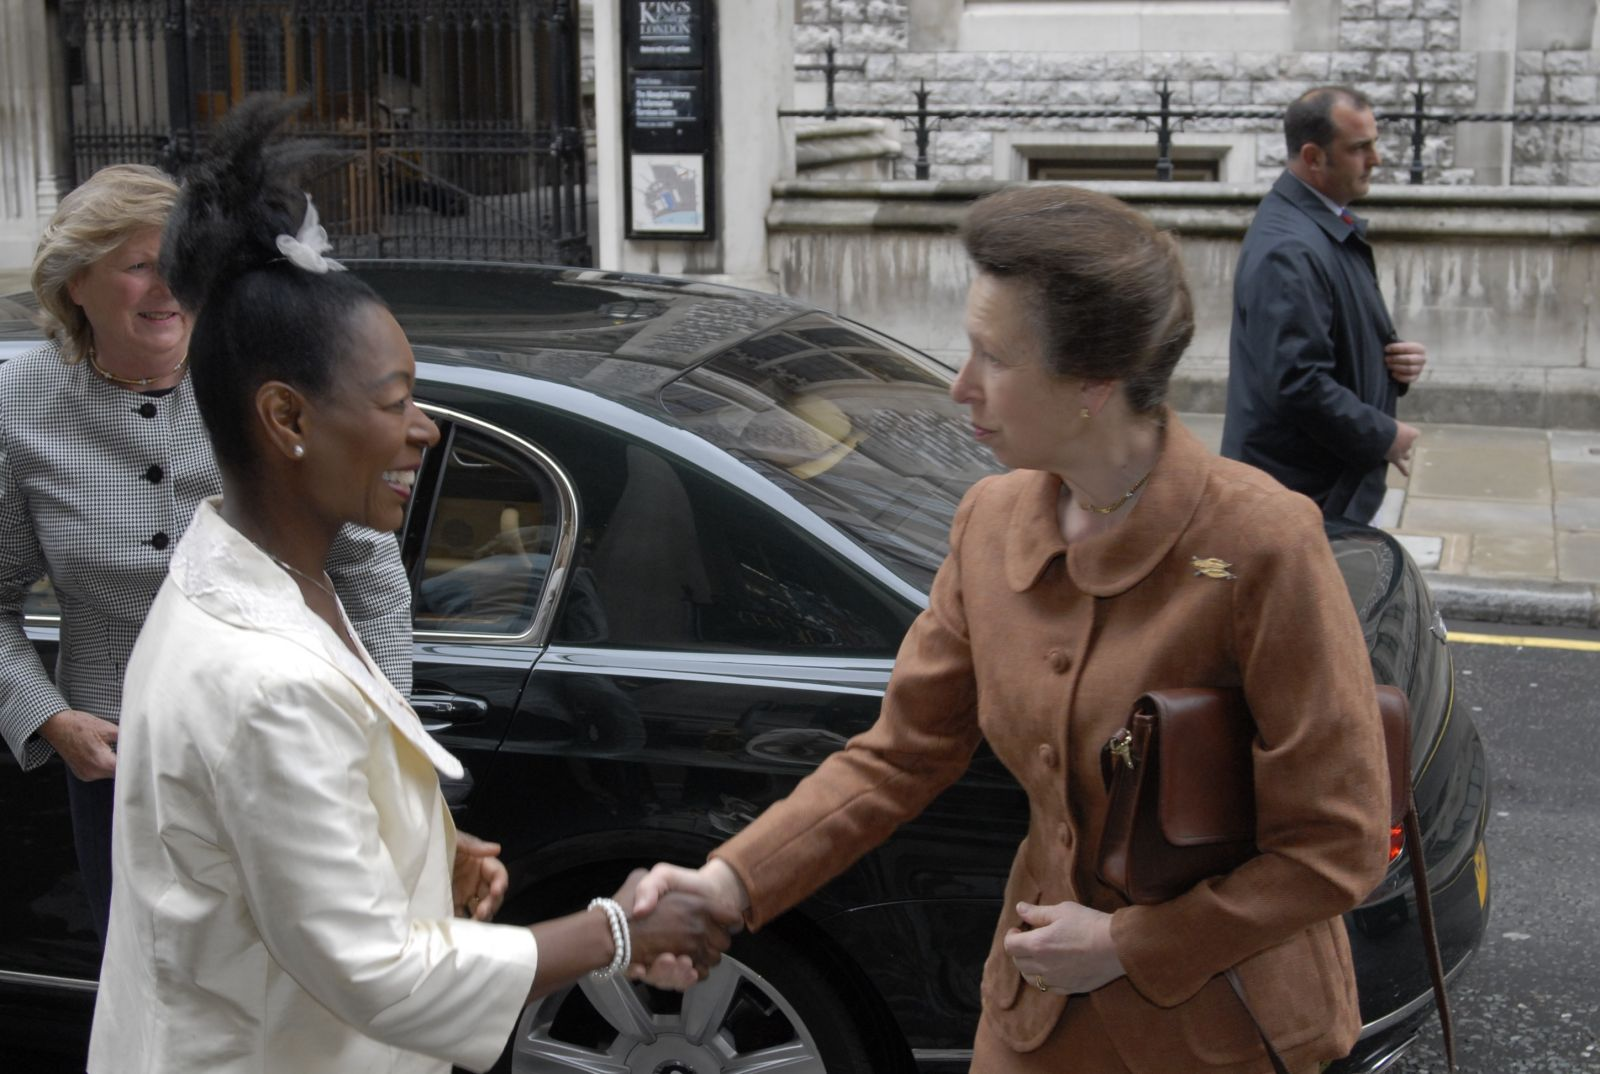 https://www.golr.org.uk/H.R. H The Princess Royal and Baroness LR Floella Benjamin